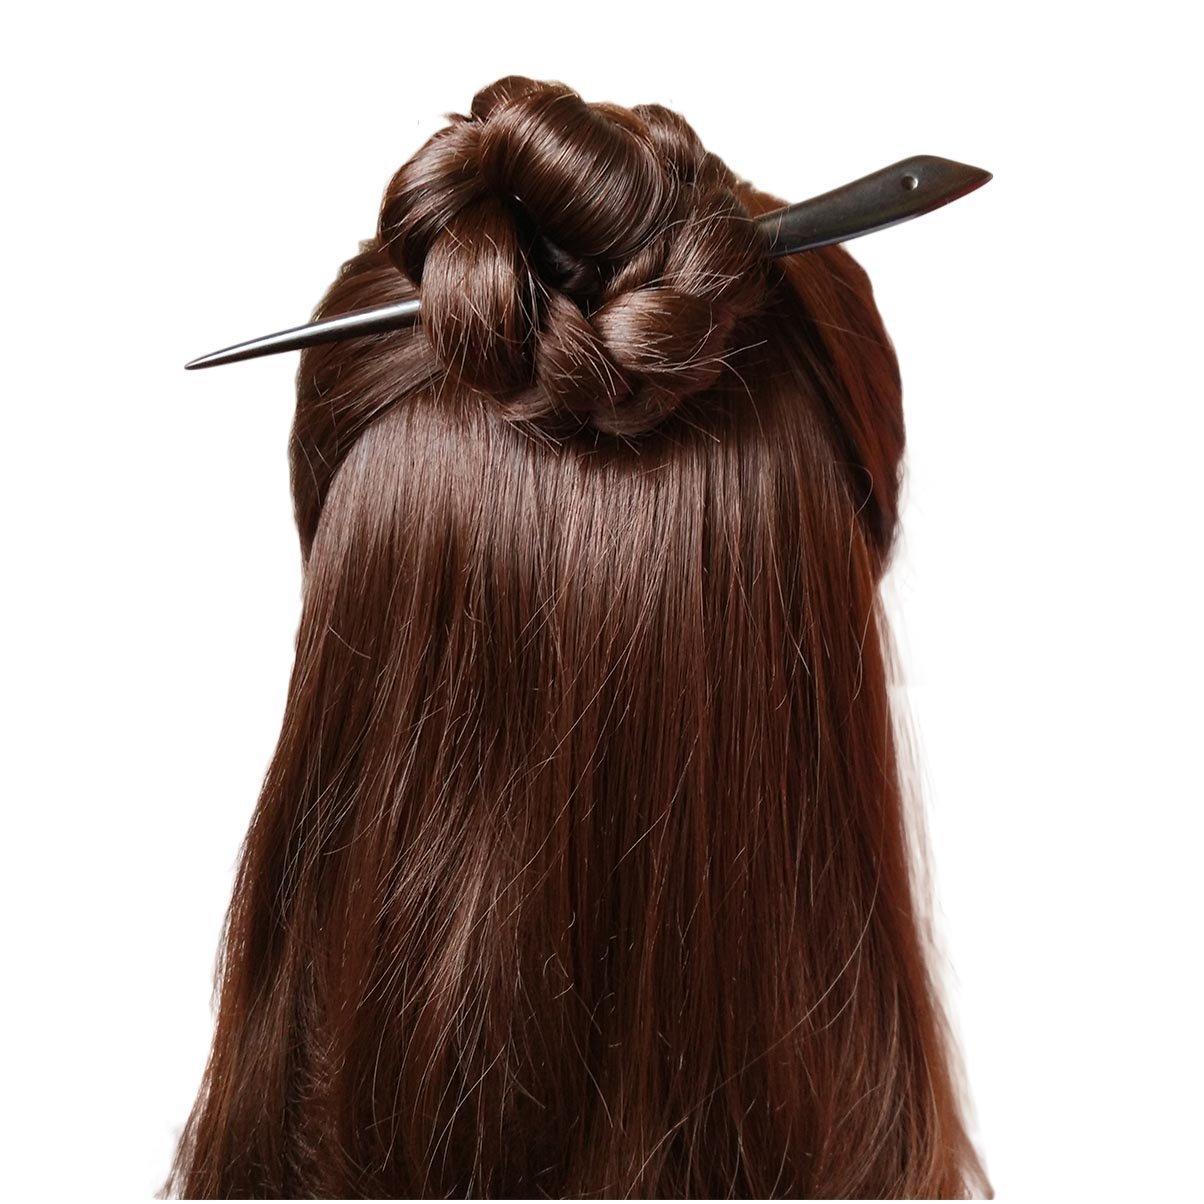 FANTAC CRAFTS Women Girl Vintage Retro Handmade Carved Ebony Black Wood Hair Stick Simple Hairpin Chignon Pin Bun Updo Tool Hair Accessories (ebony hair stick)